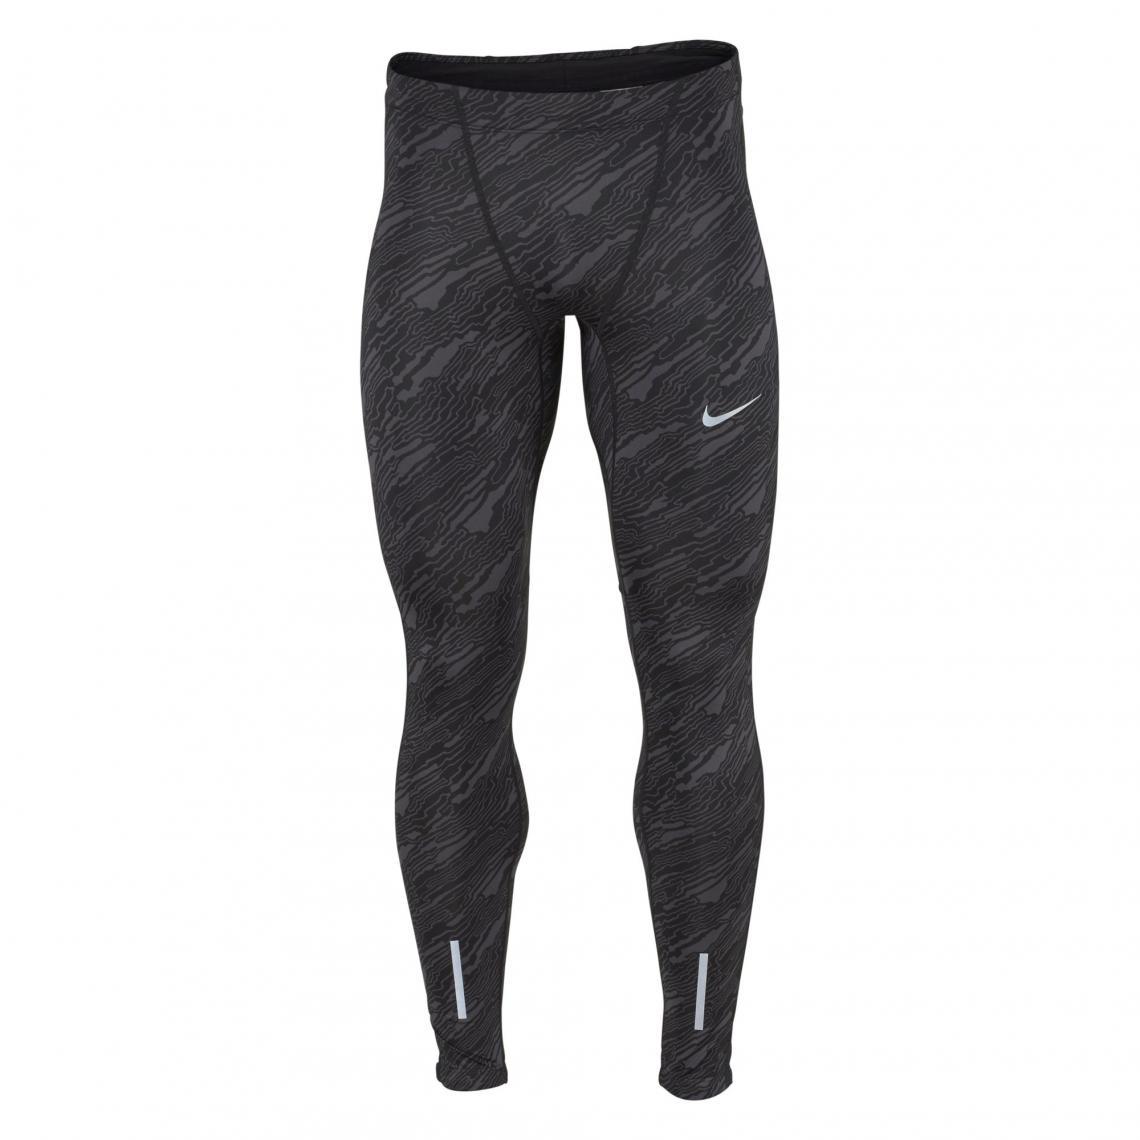 Collant de running homme Dri-FIT Tech Elevated Tight Nike - Noir Nike 6b6d97268b9